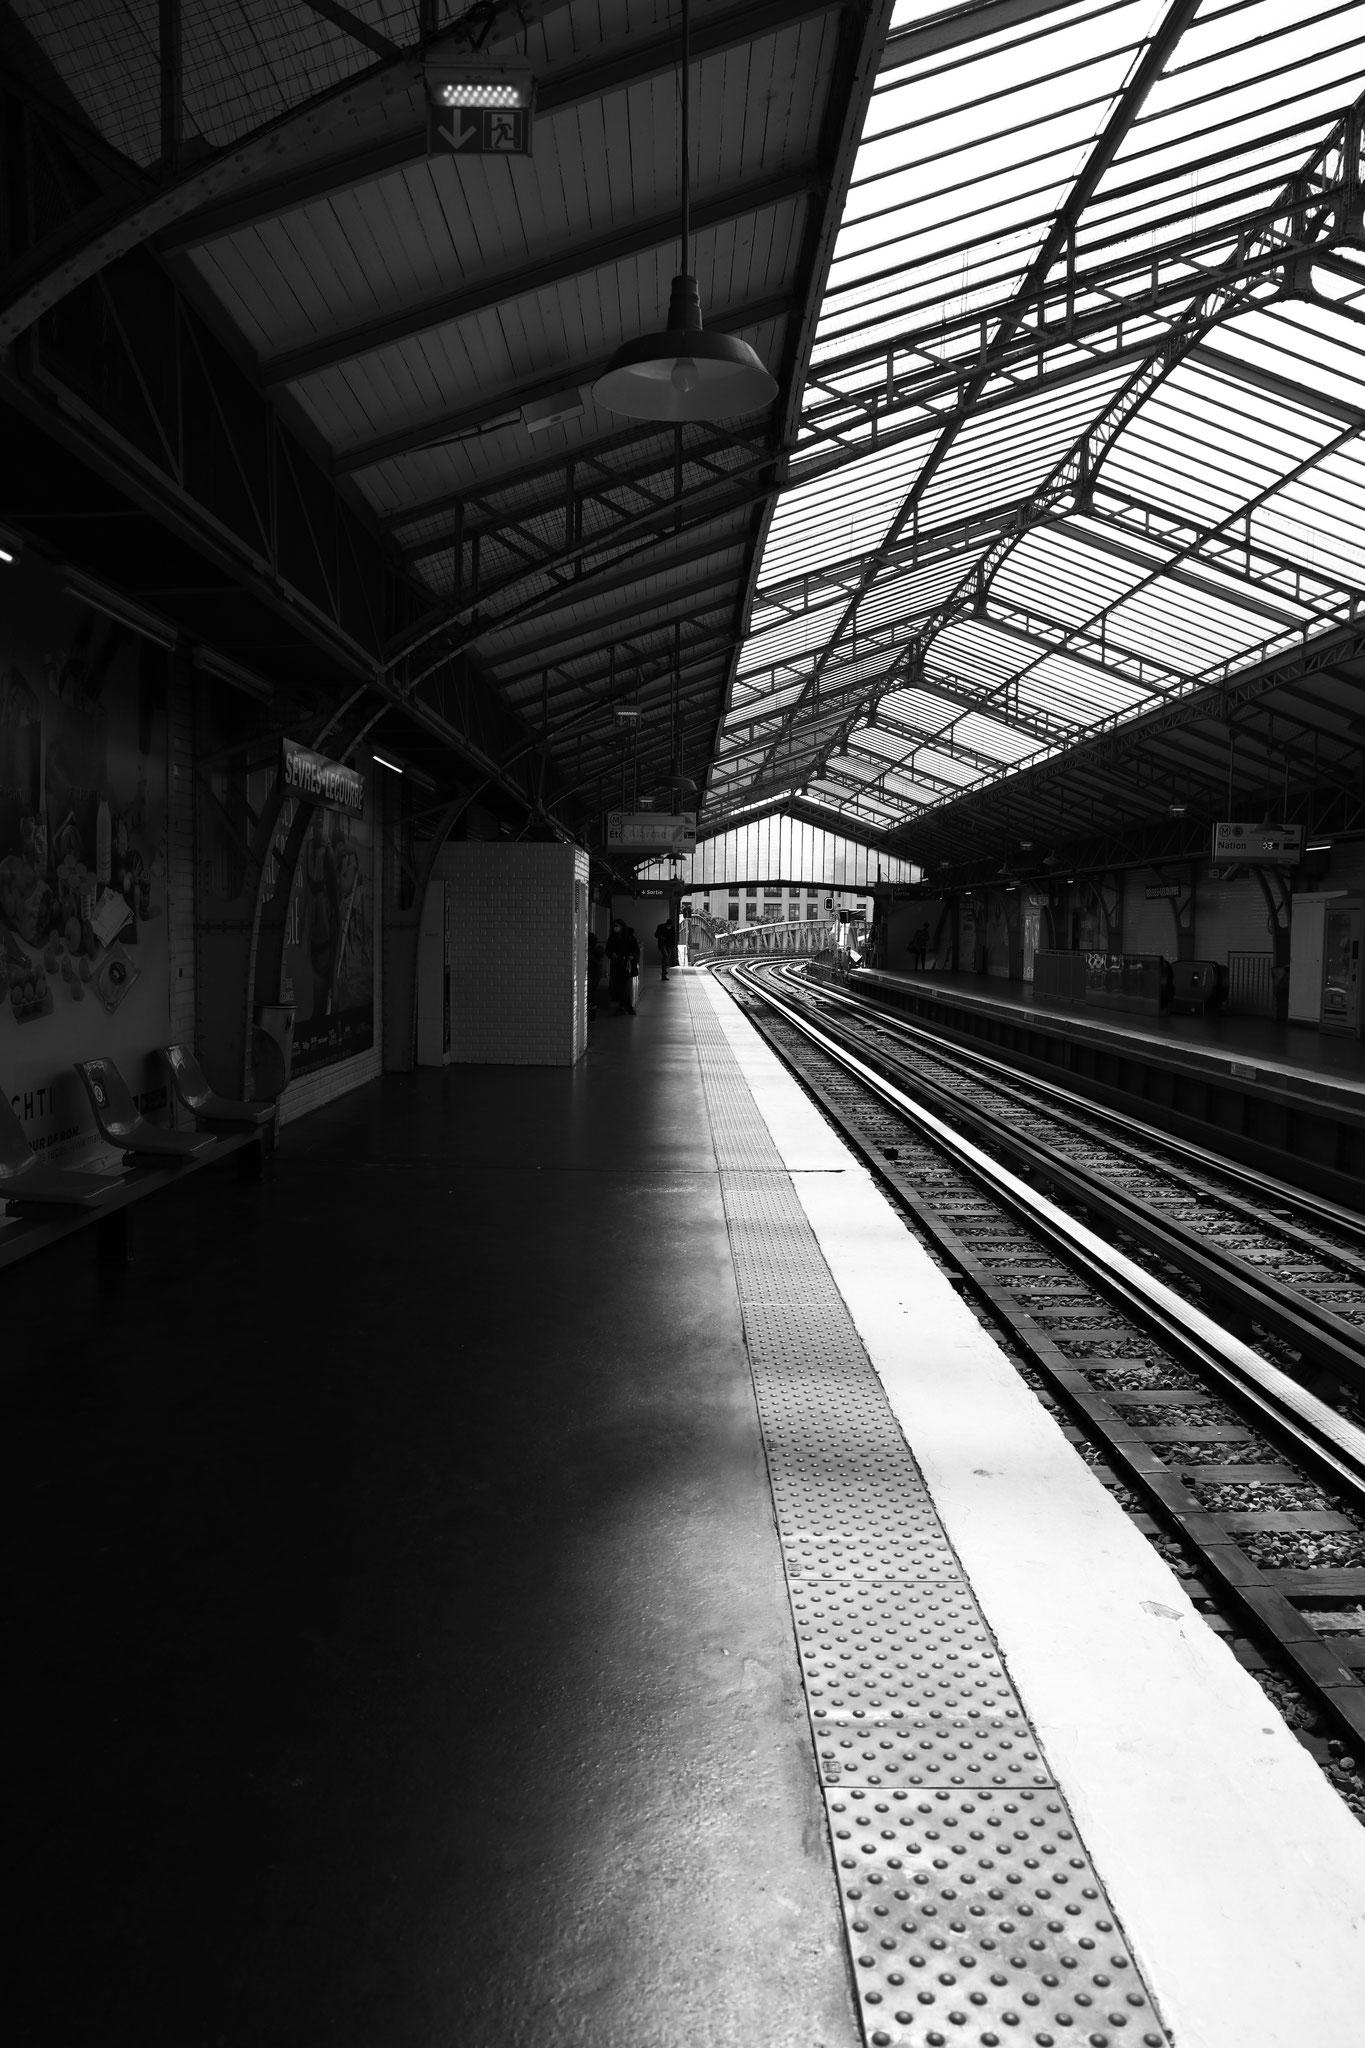 """Light on board"" - Station Sèvres Lecourbe (M°6), Paris (2021). Canon 5D Mark IV + 24-105mm. ©Clémence Rougetet"